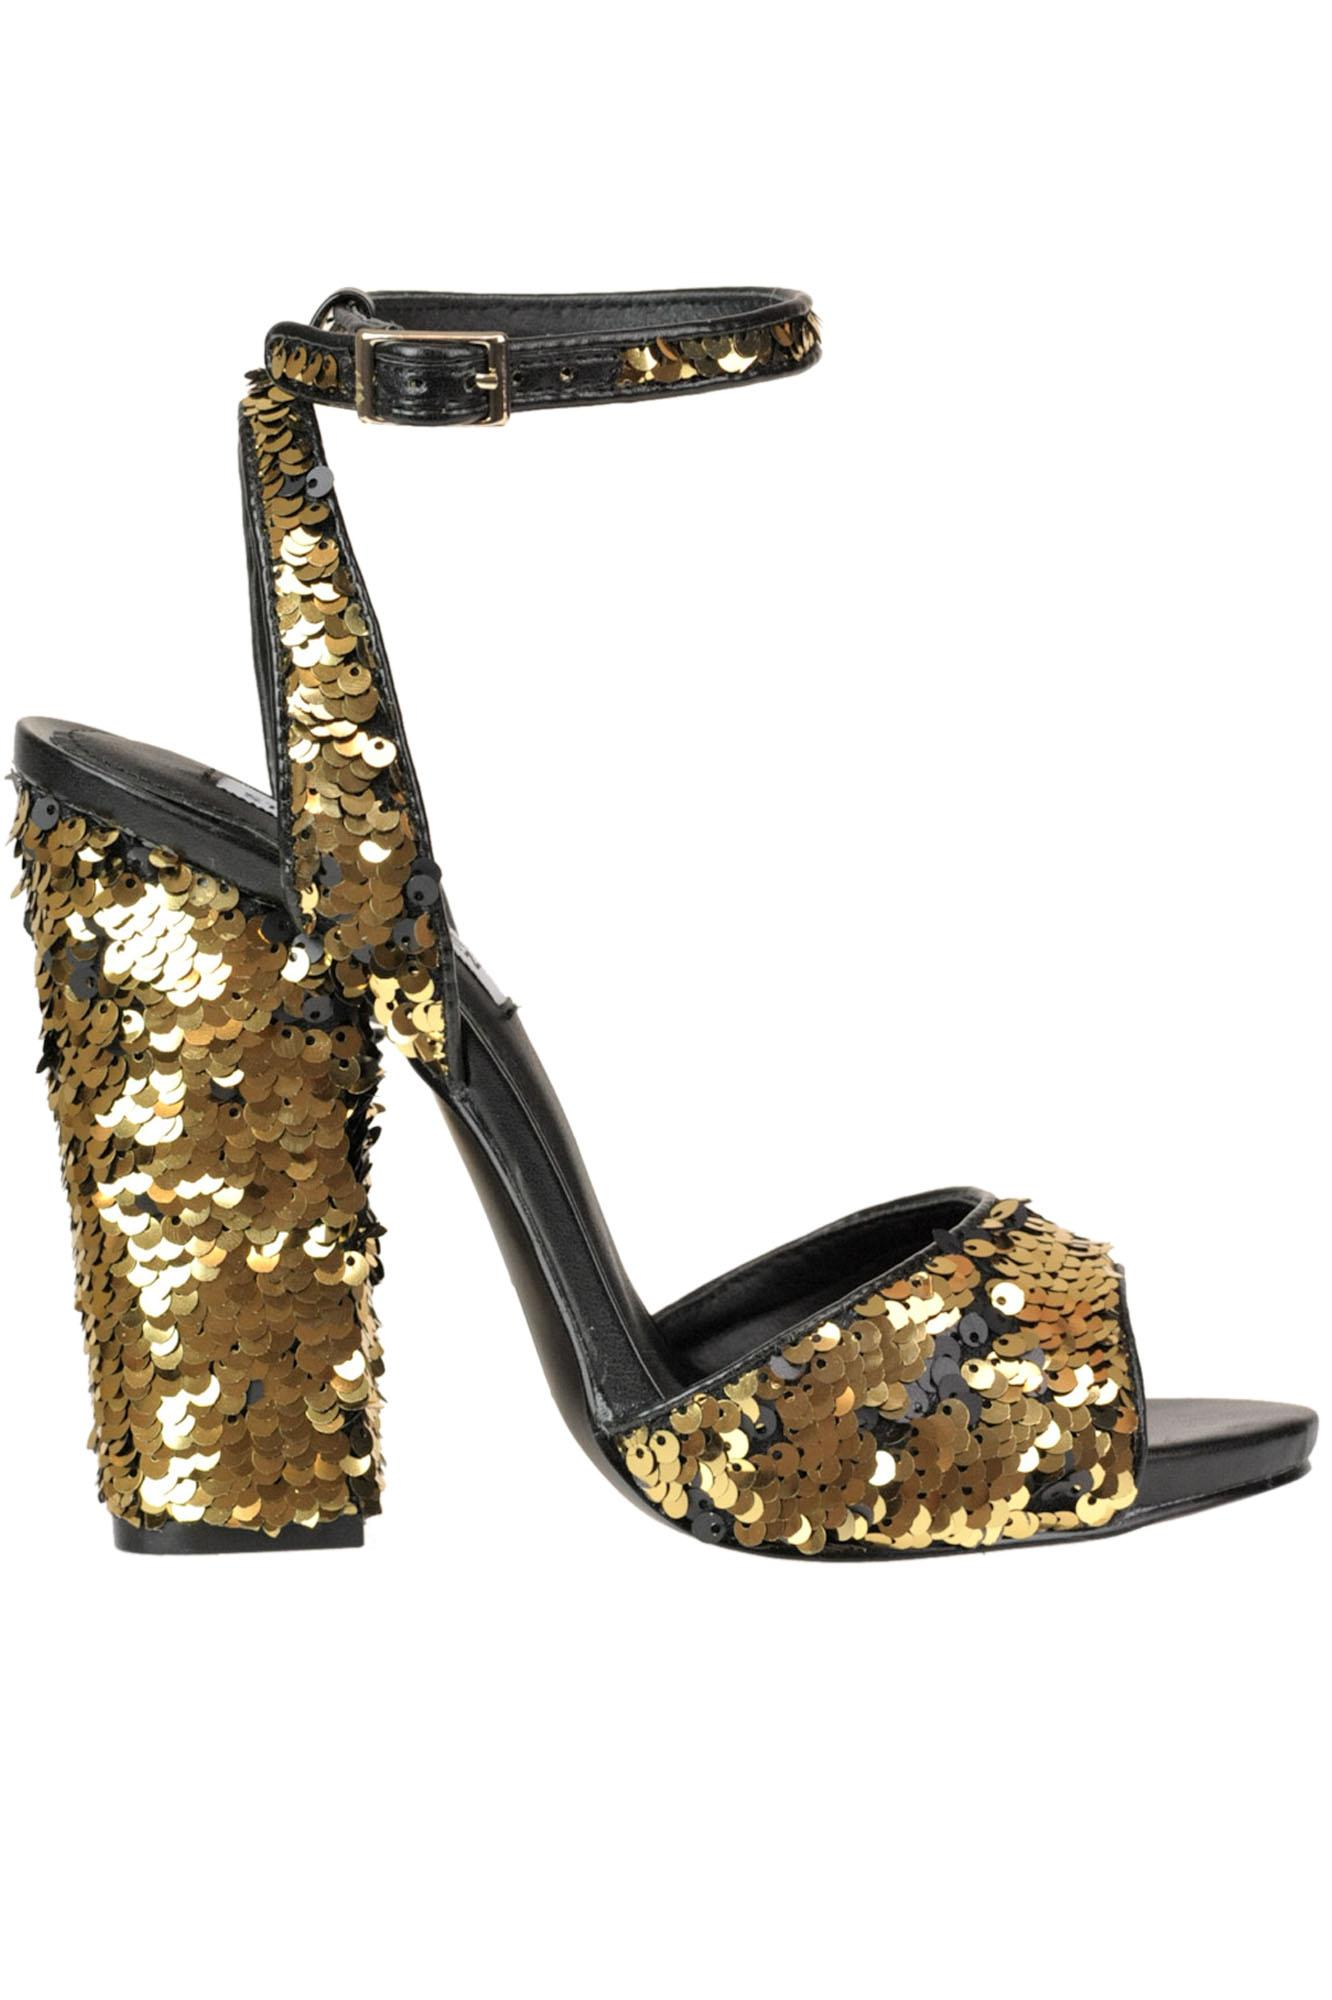 94640c24642 Lyst - Steve Madden Sequined Sandals in Metallic